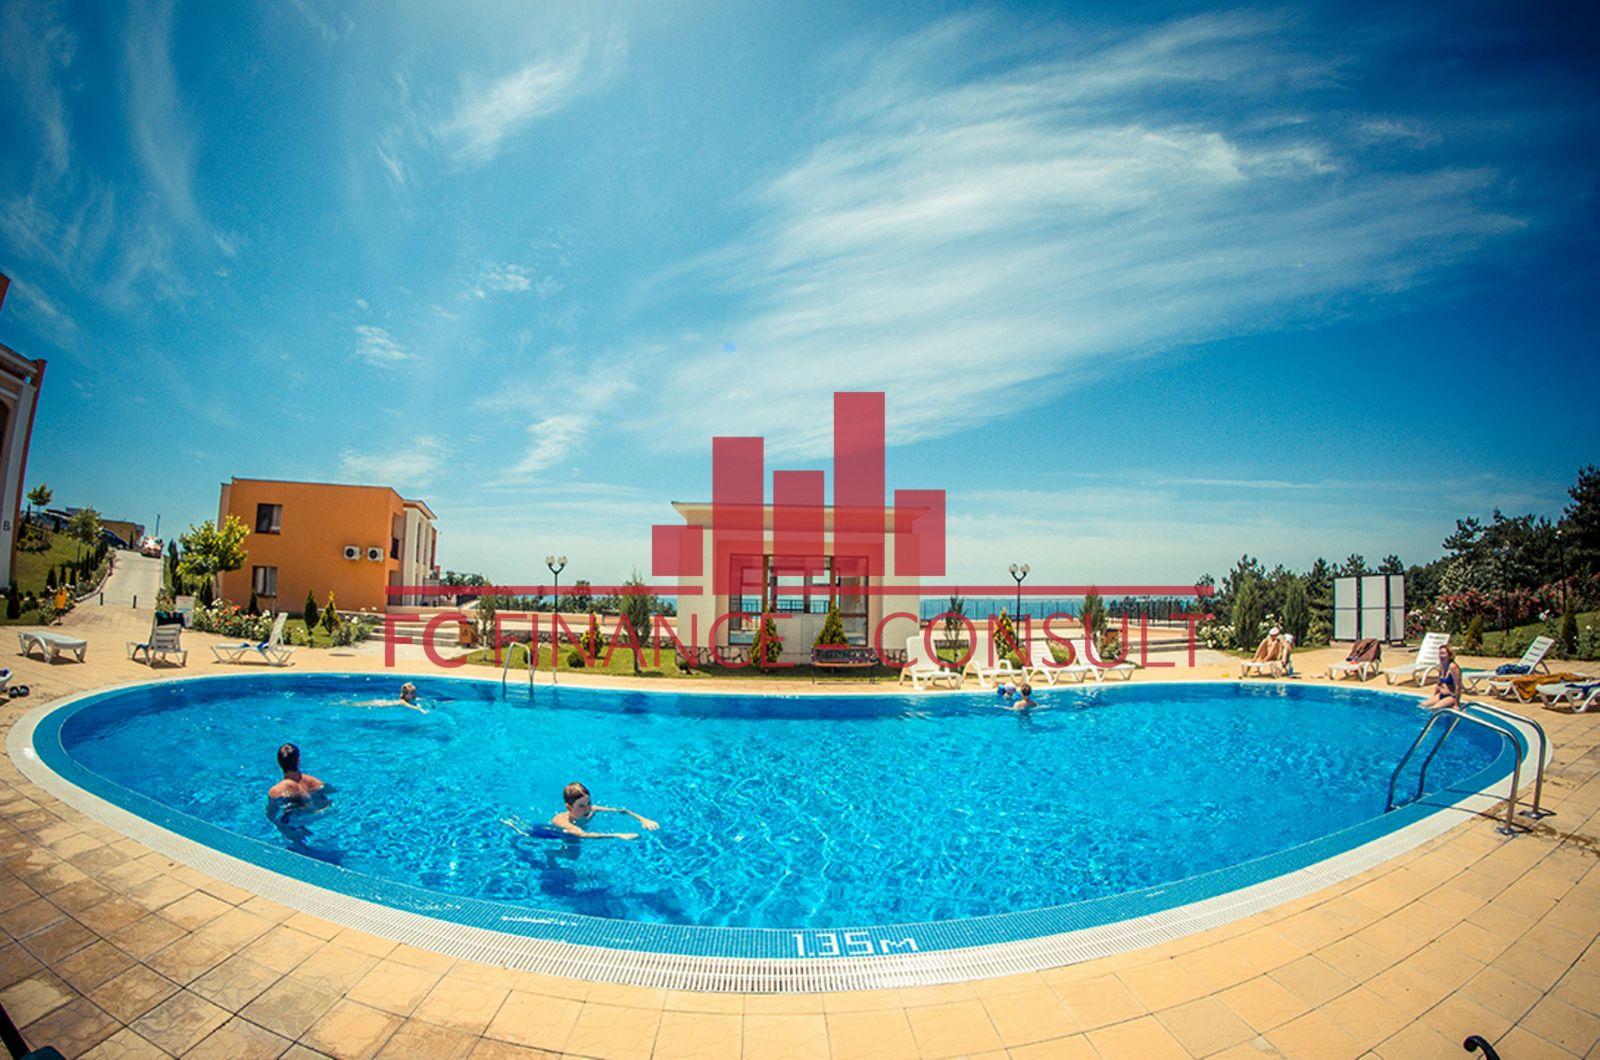 Apartmán 3kk na splátky s výhledem na hory a moře, v novém komplexu, Sveti Vlas, Bulharsko